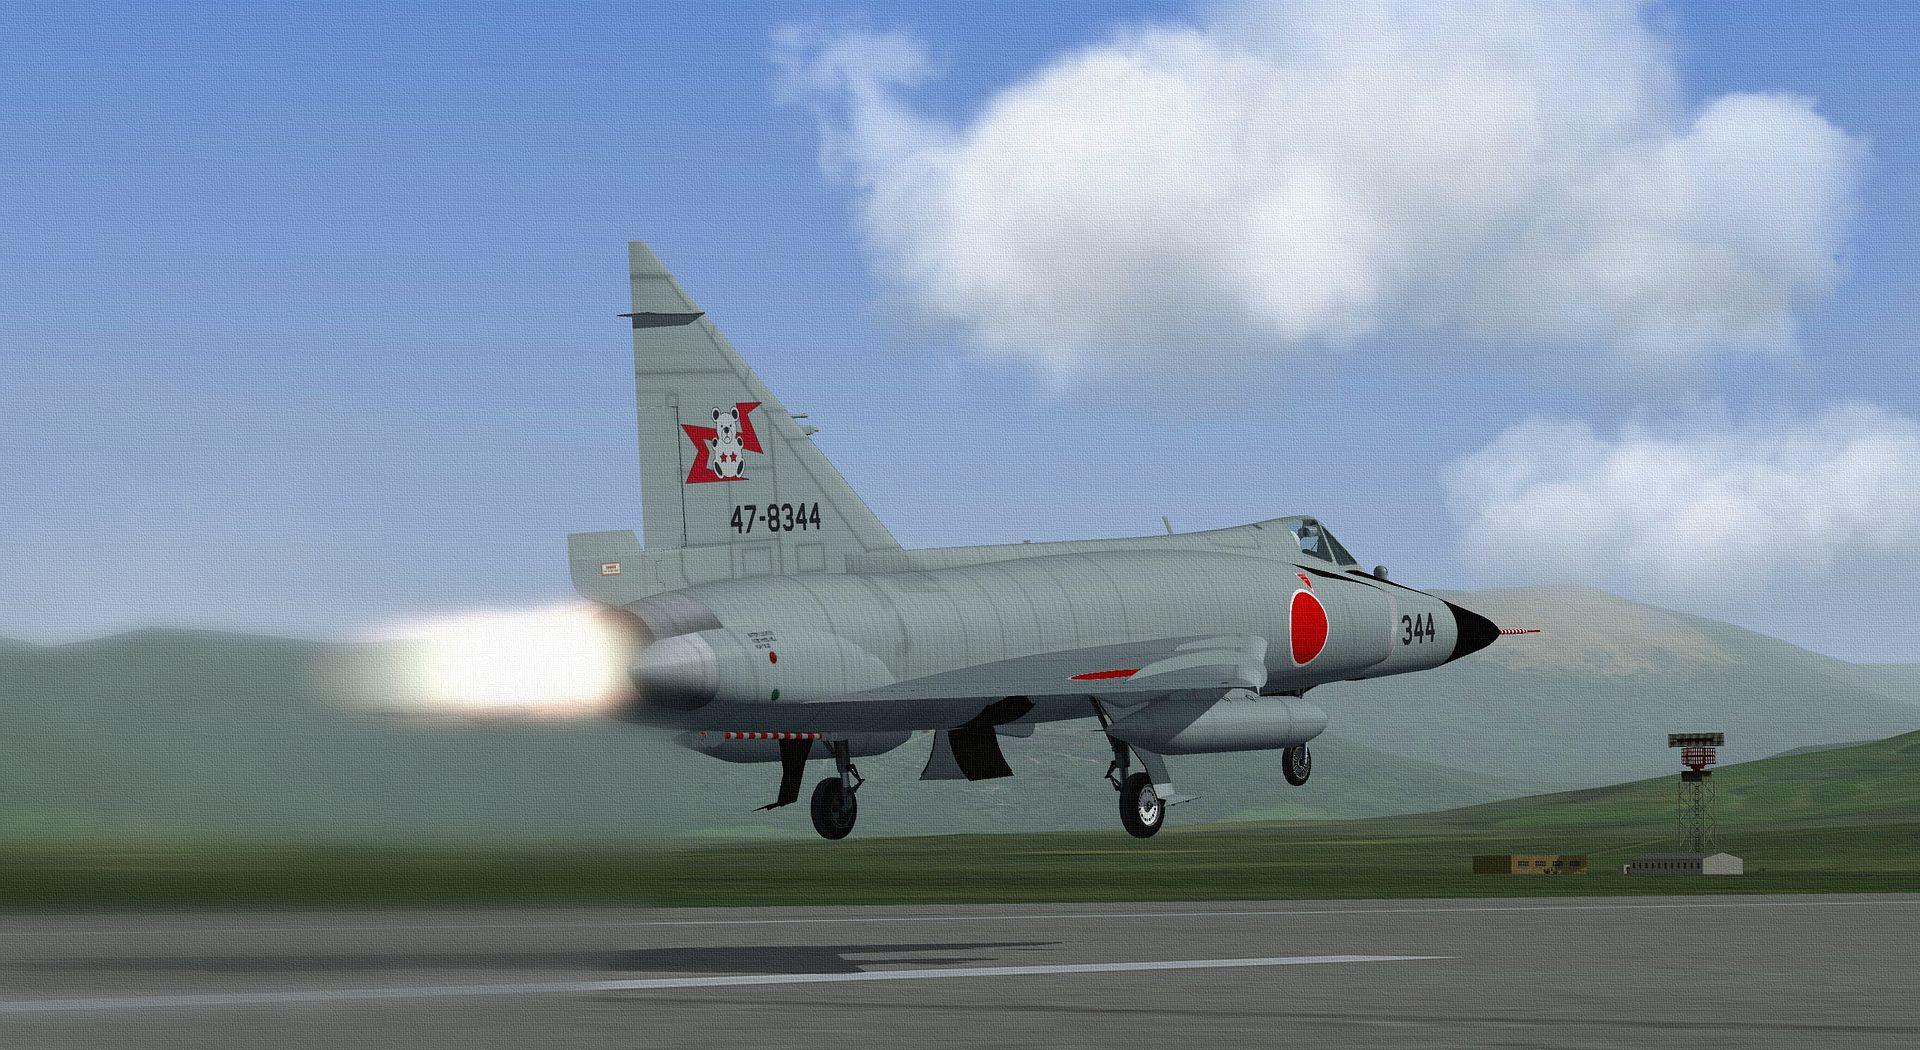 JASDF%20F-102A%20DELTA%20DAGGER.02_zpswt